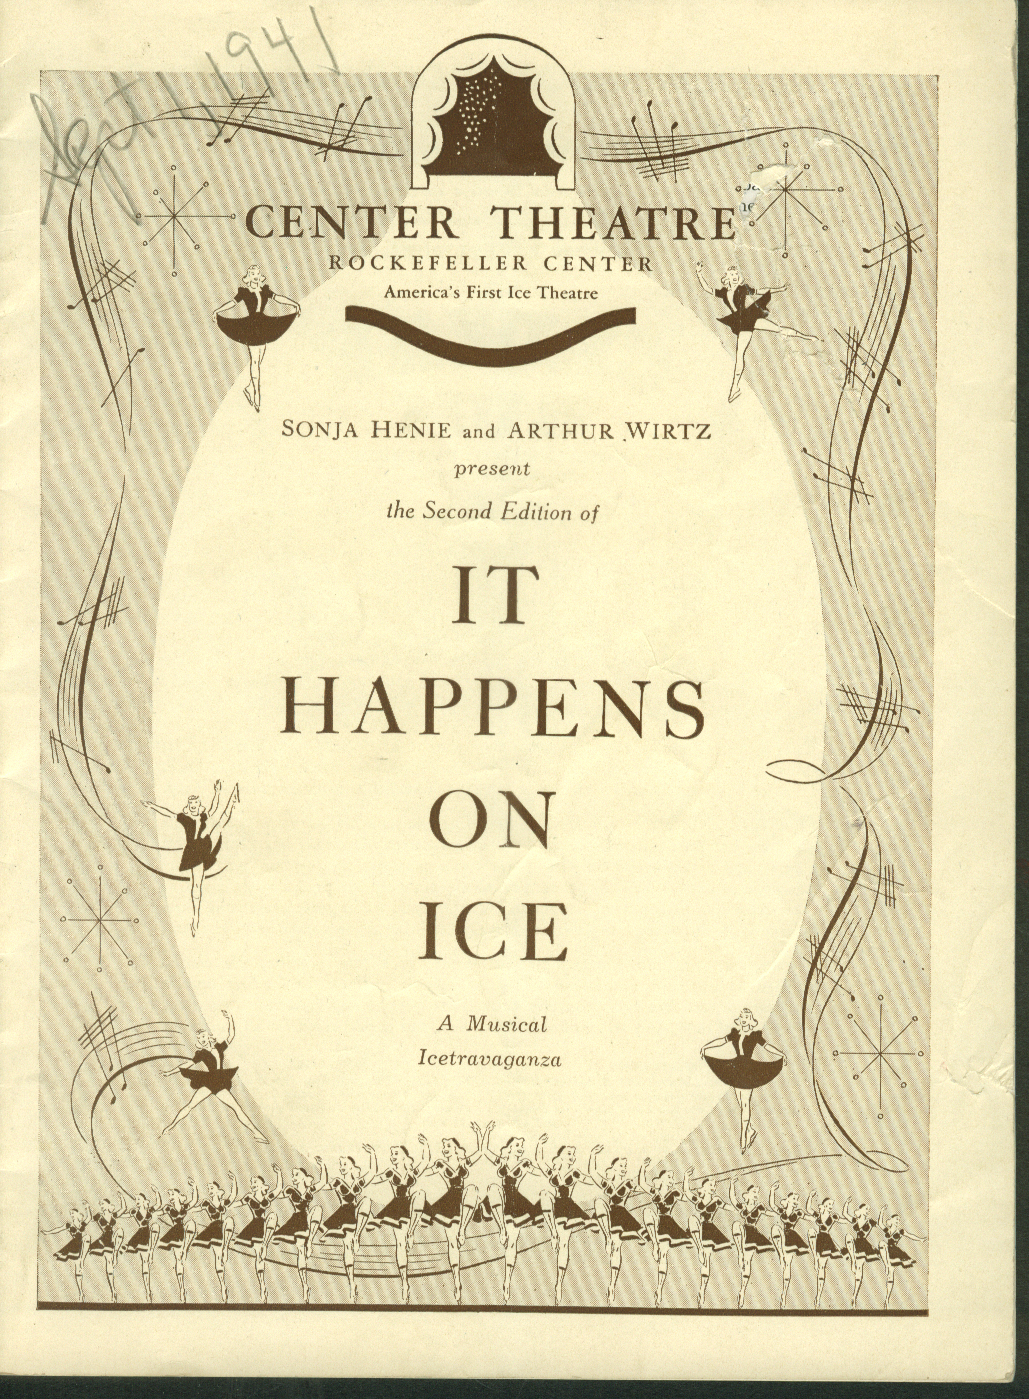 Center Theatre Program It Happens On Ice 2nd Edition Sonja Henie 1941